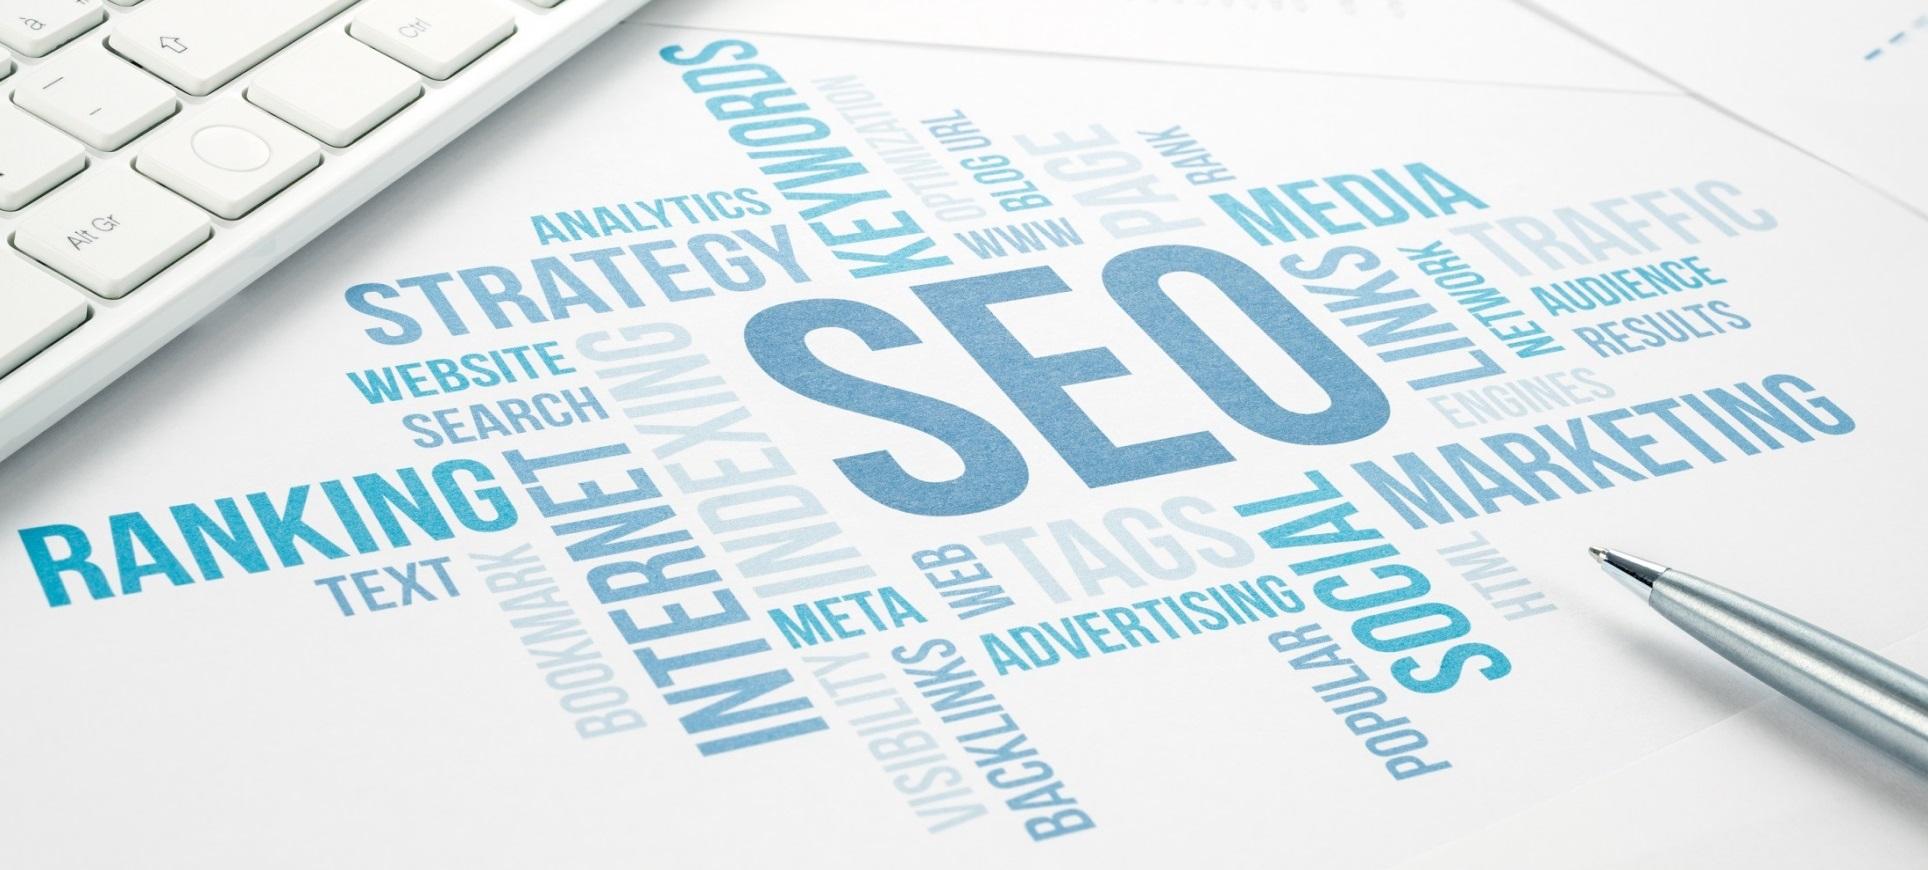 Apa Itu Search Engine Optimization ( SEO ) ?